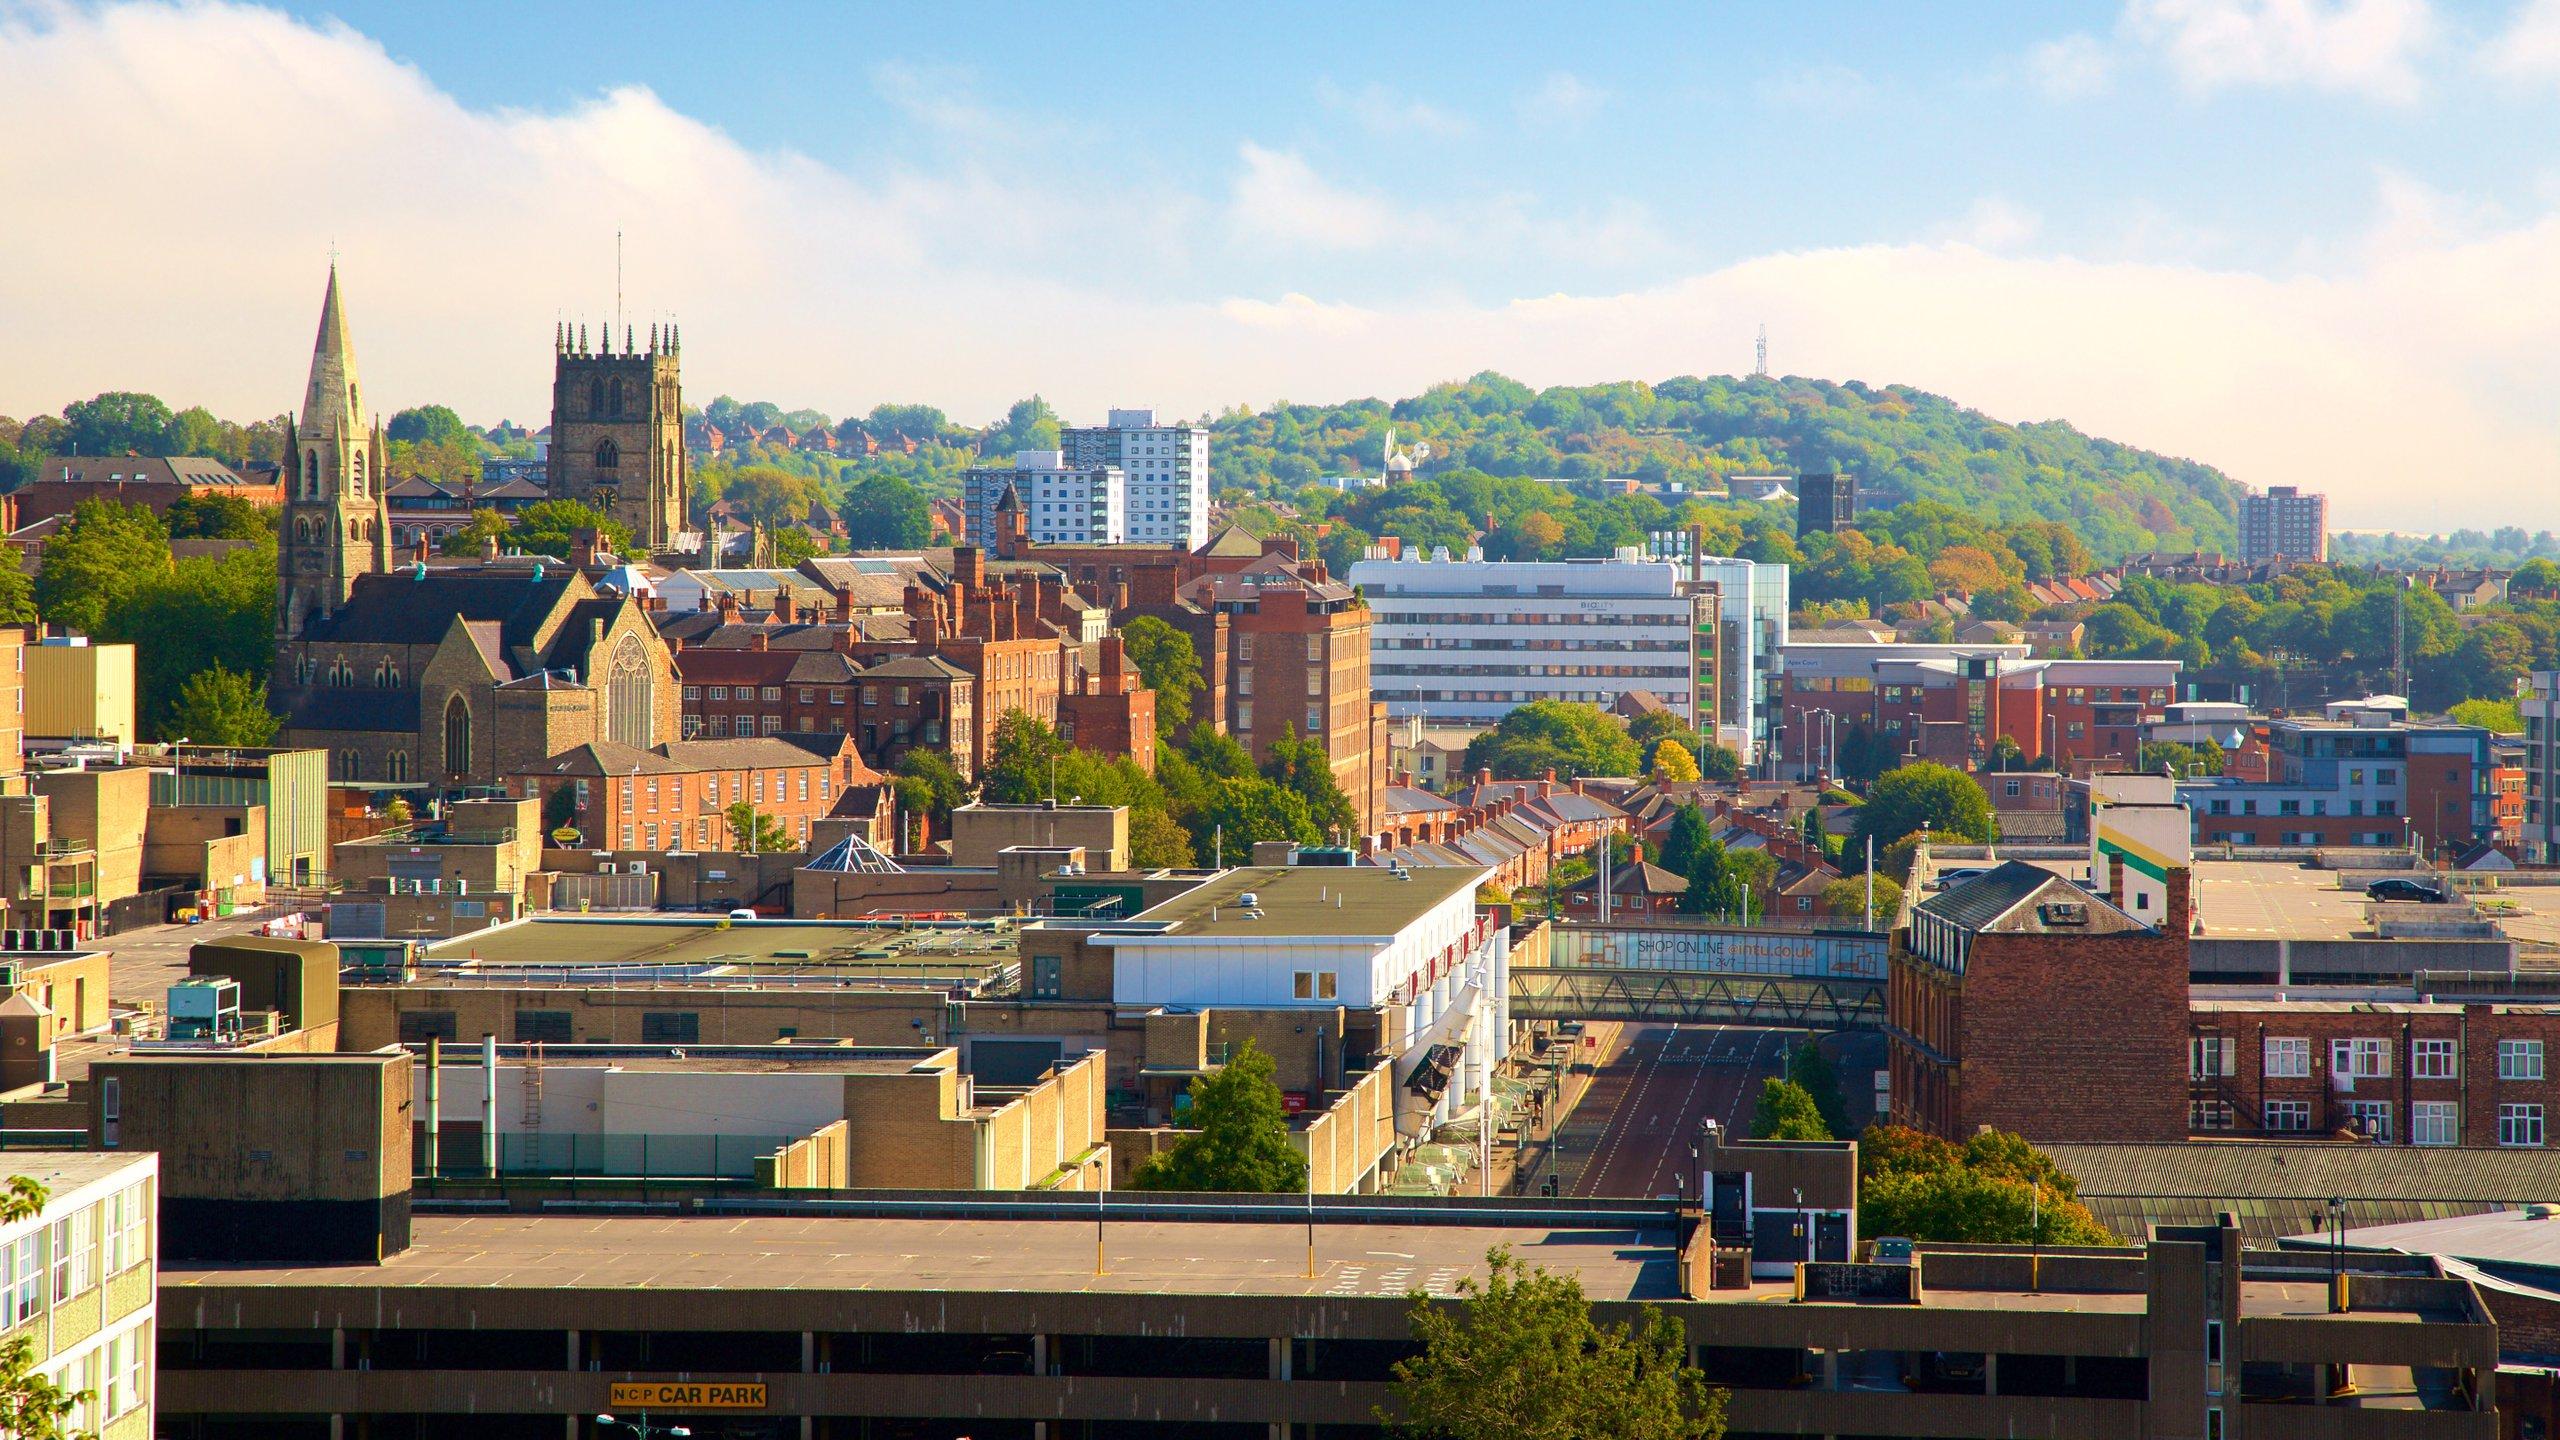 Newark and Sherwood District, England, United Kingdom